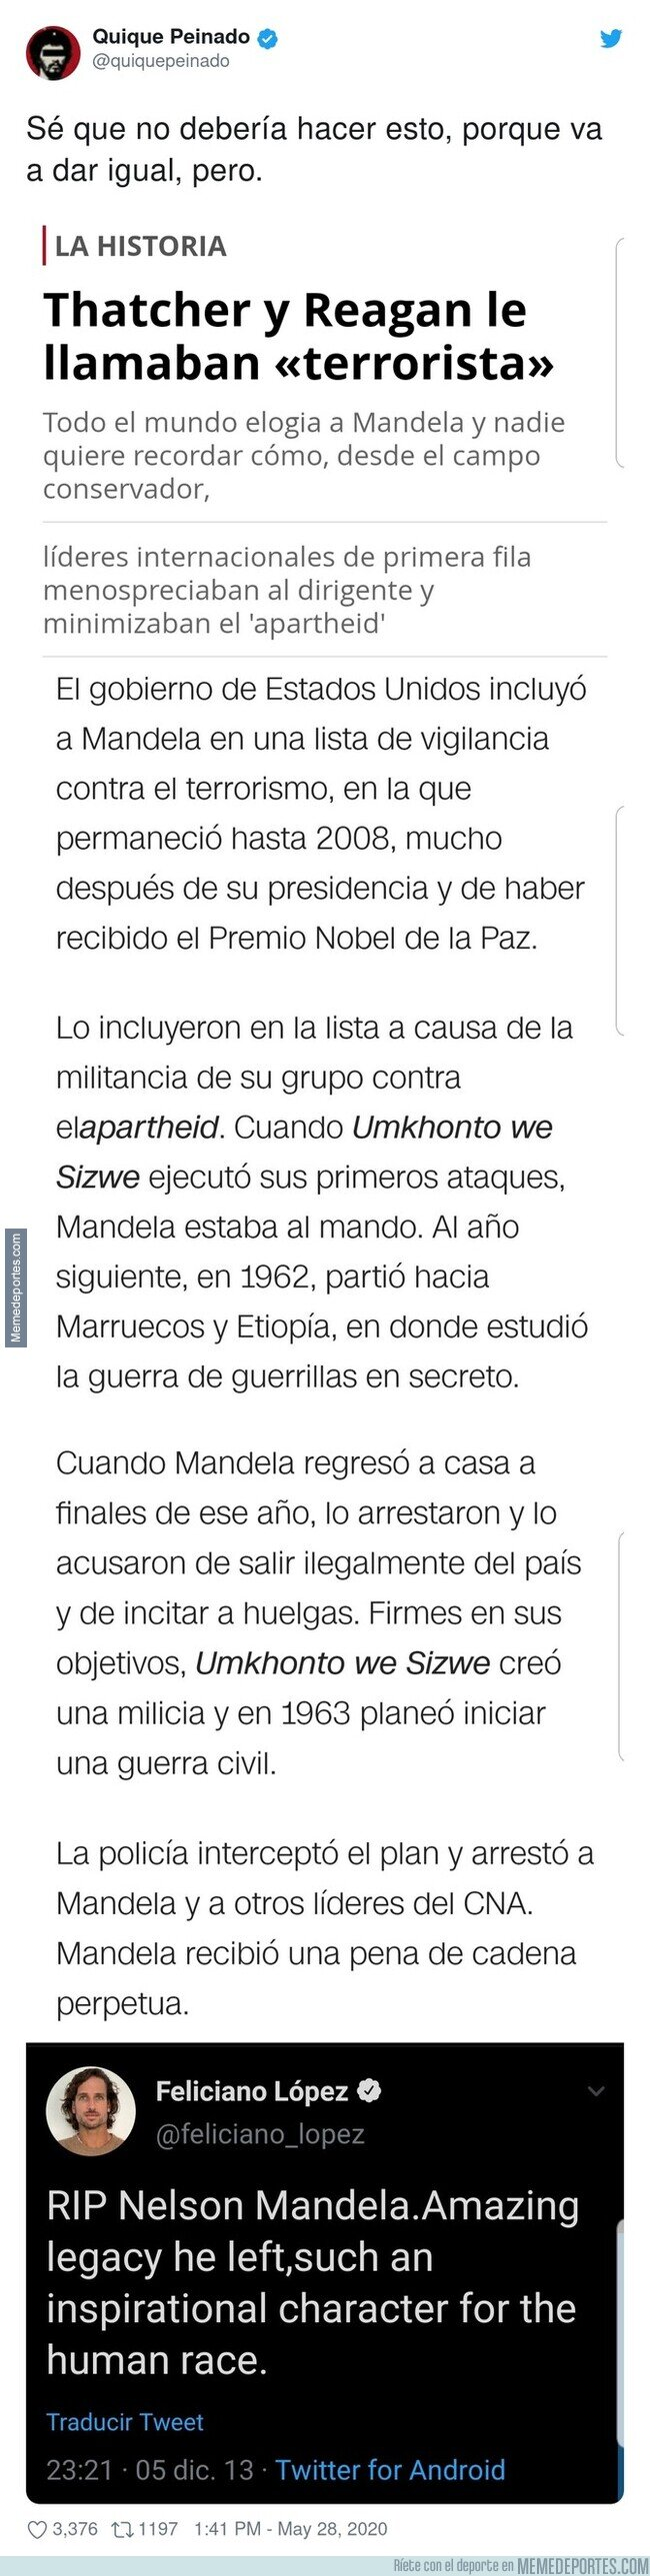 1105445 - Quique Peinado destroza por completo a Feliciano López recordándole este tuit sobre Nelson Mandela